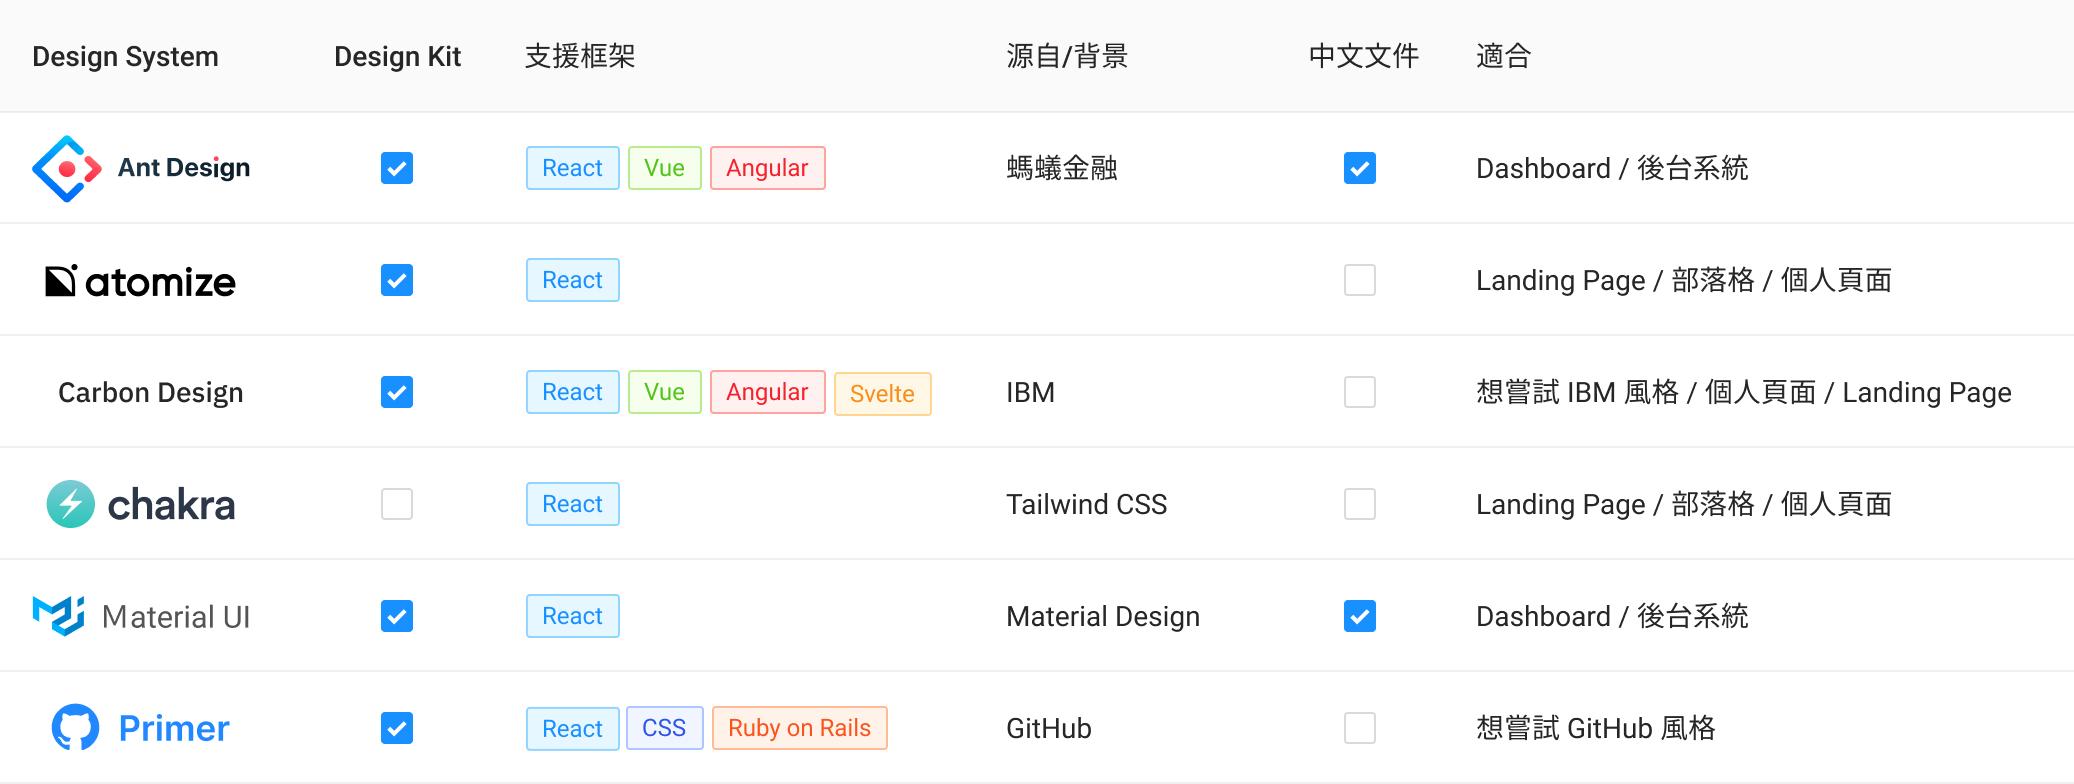 各 Design System 比較 - 讓人心動的 6 個 React Design Systems